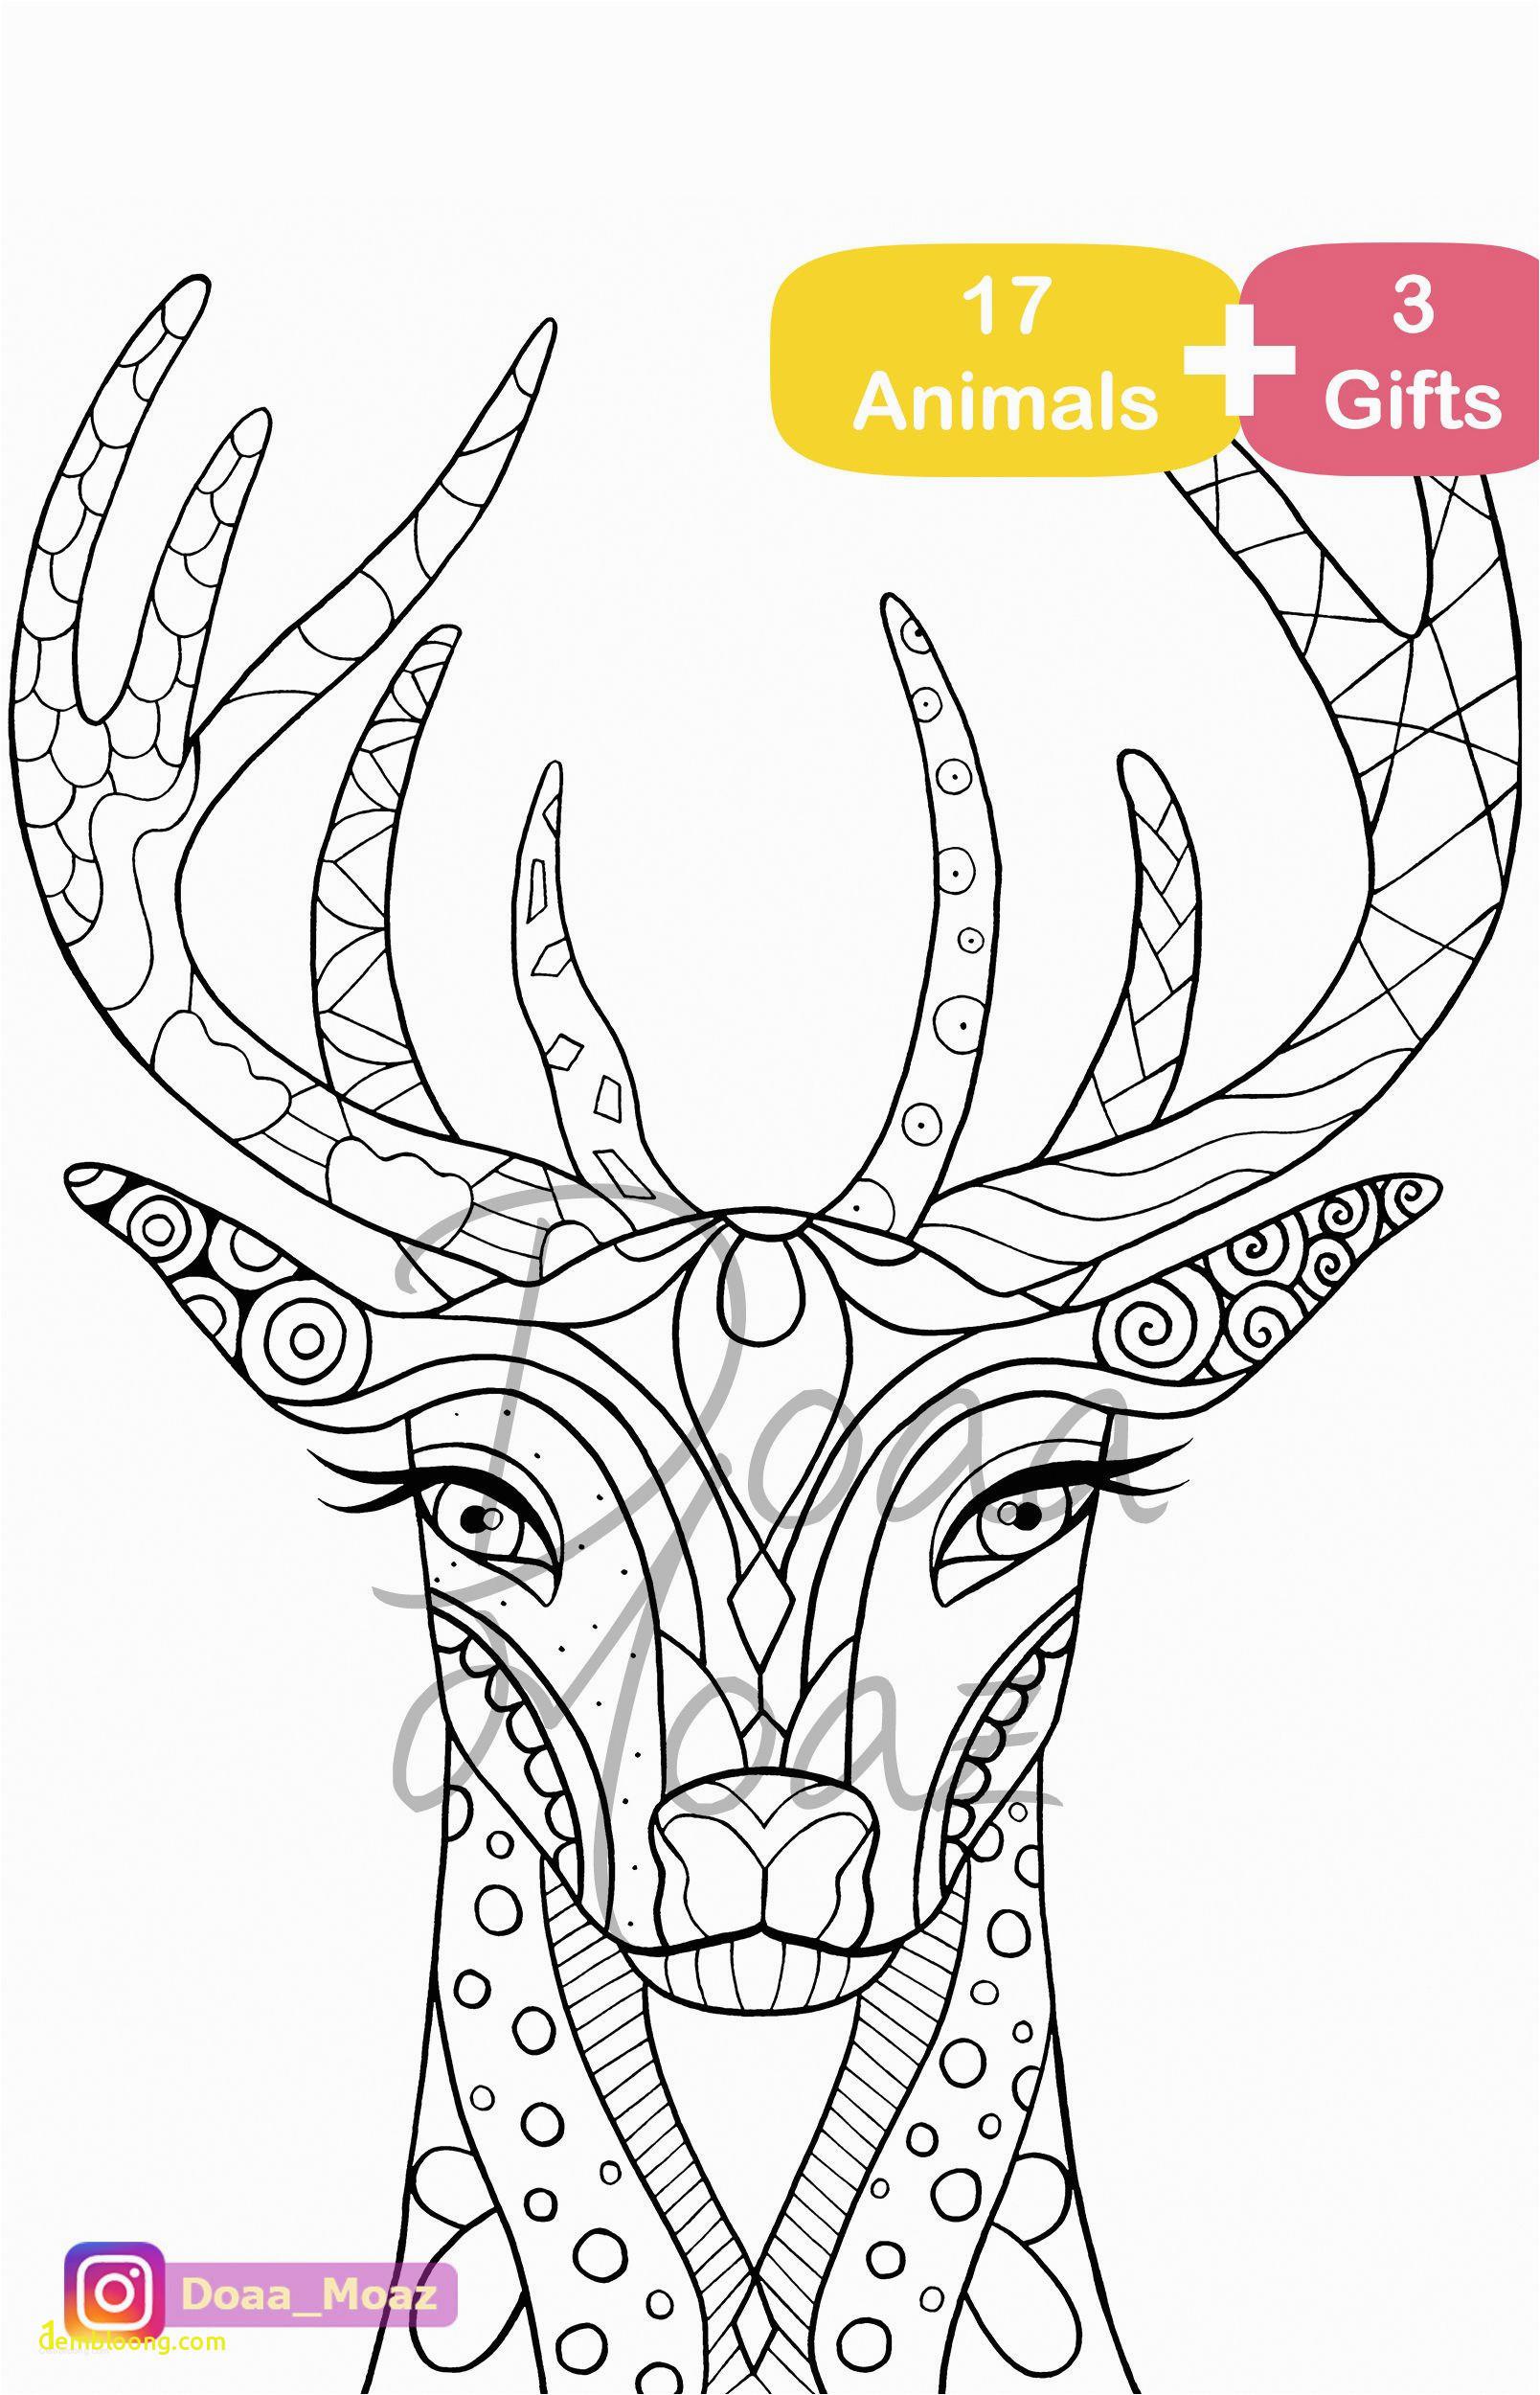 mandala coloring book for adults pdf beautiful coloring pages coloring pages for adults pdf new adult of mandala coloring book for adults pdf